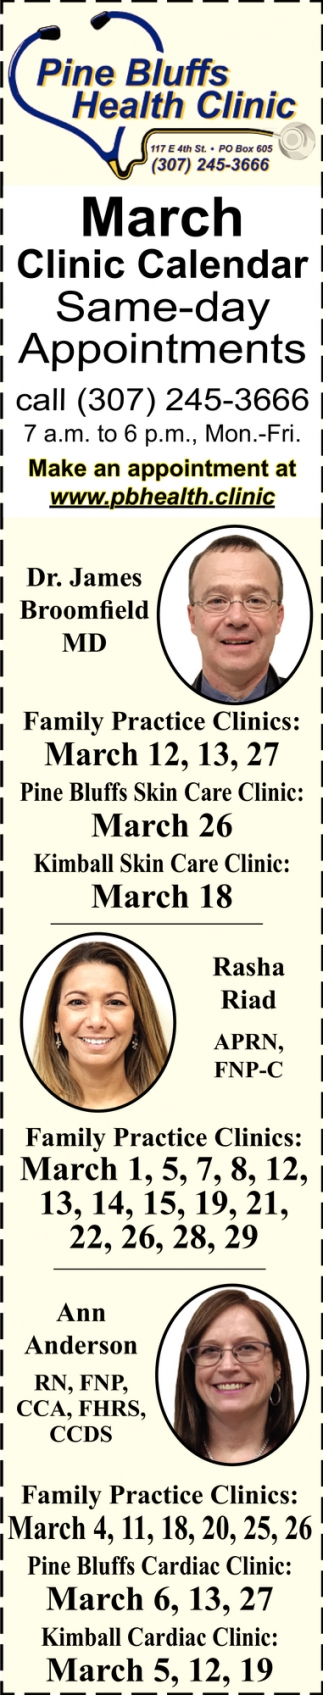 March Clinic Calendar